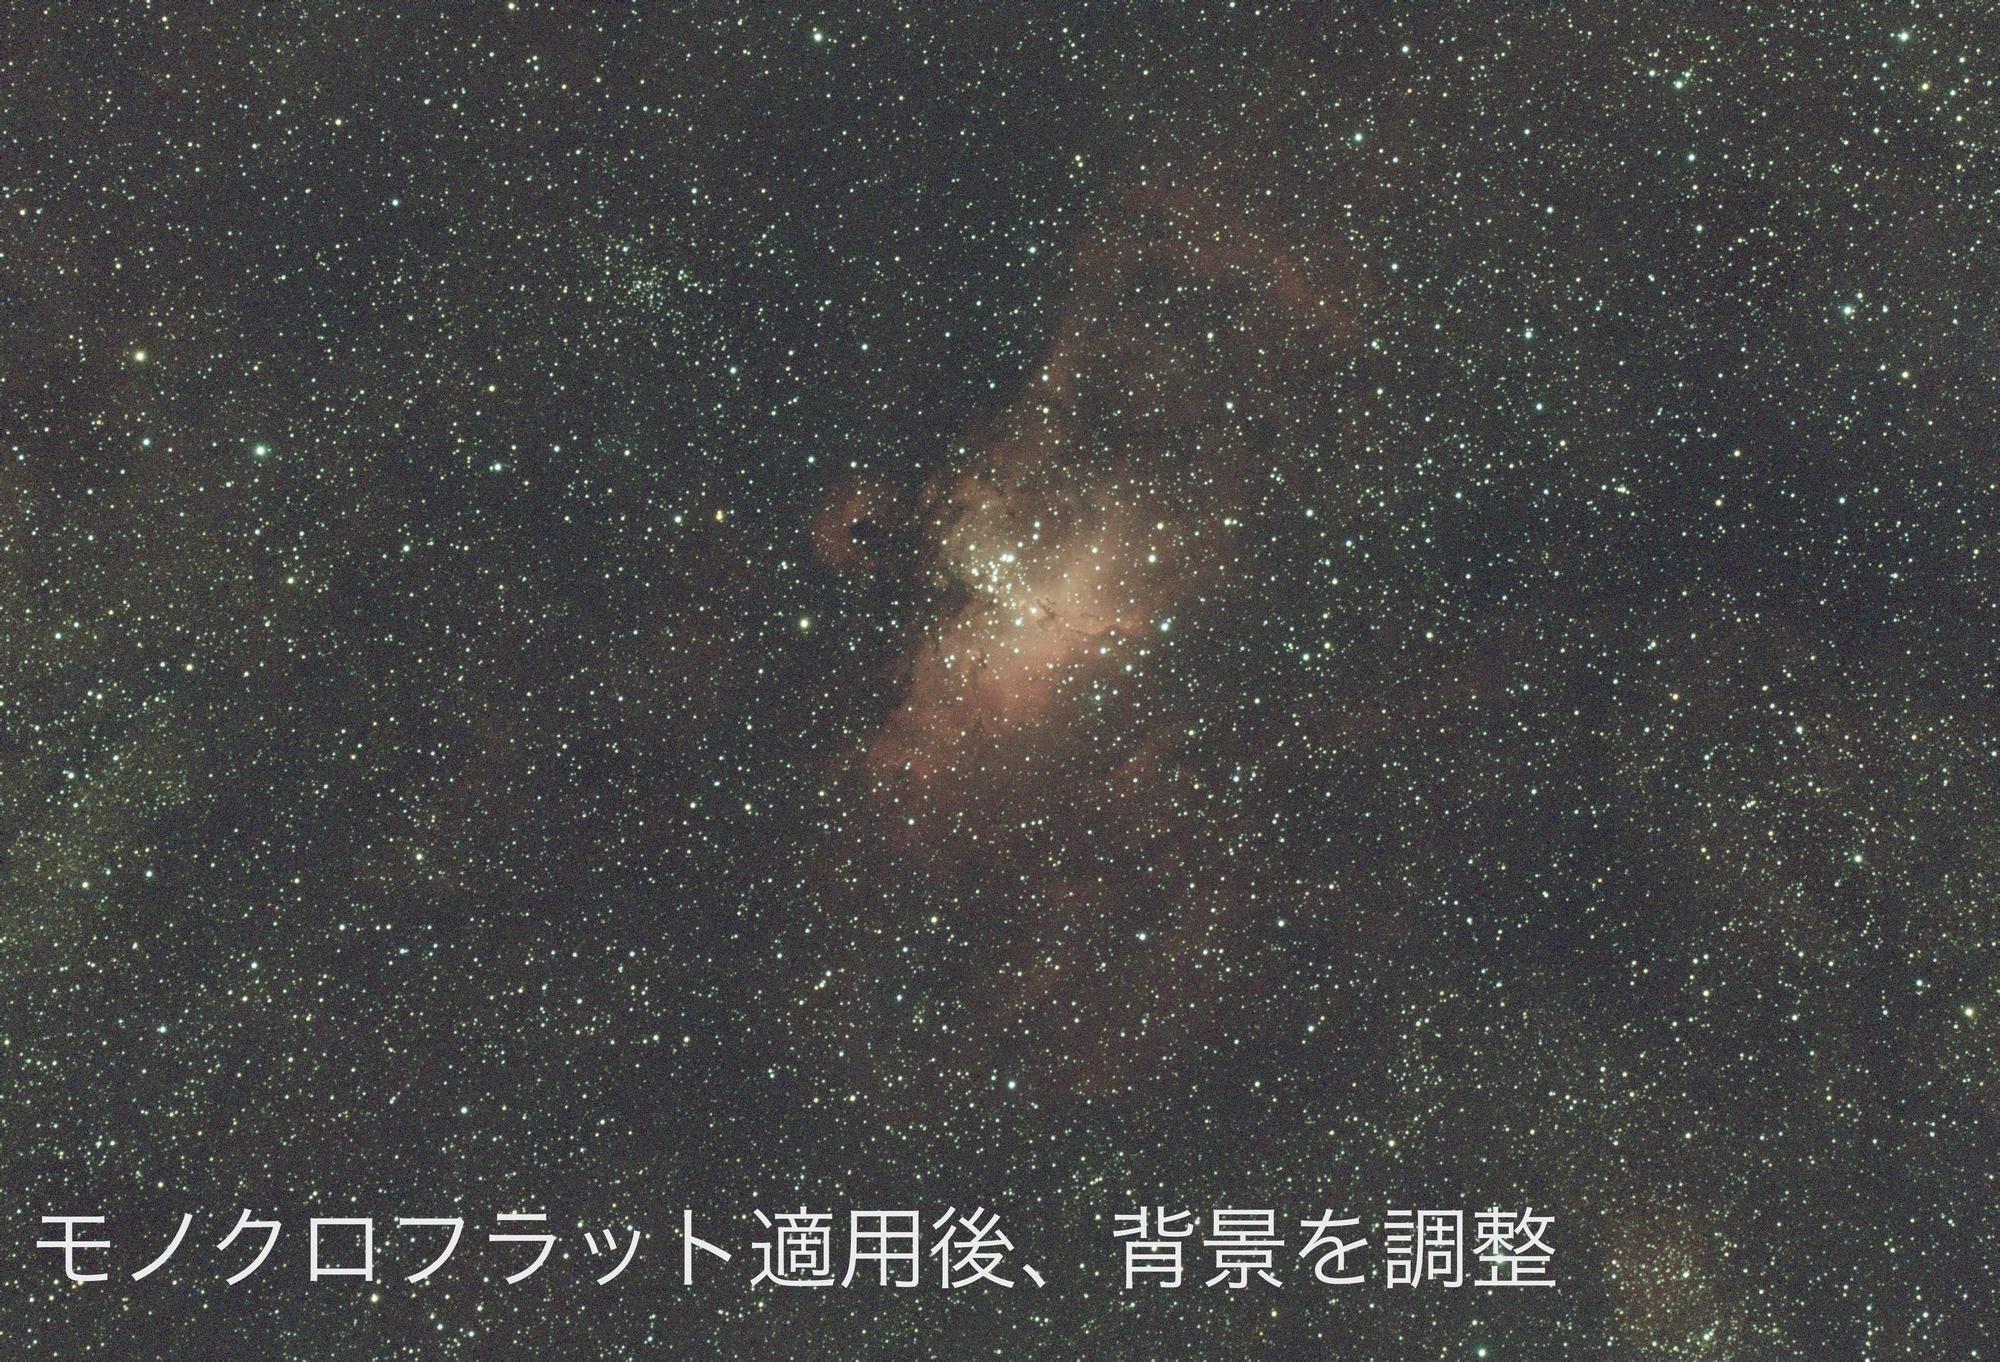 f:id:snct-astro:20200519233219j:plain